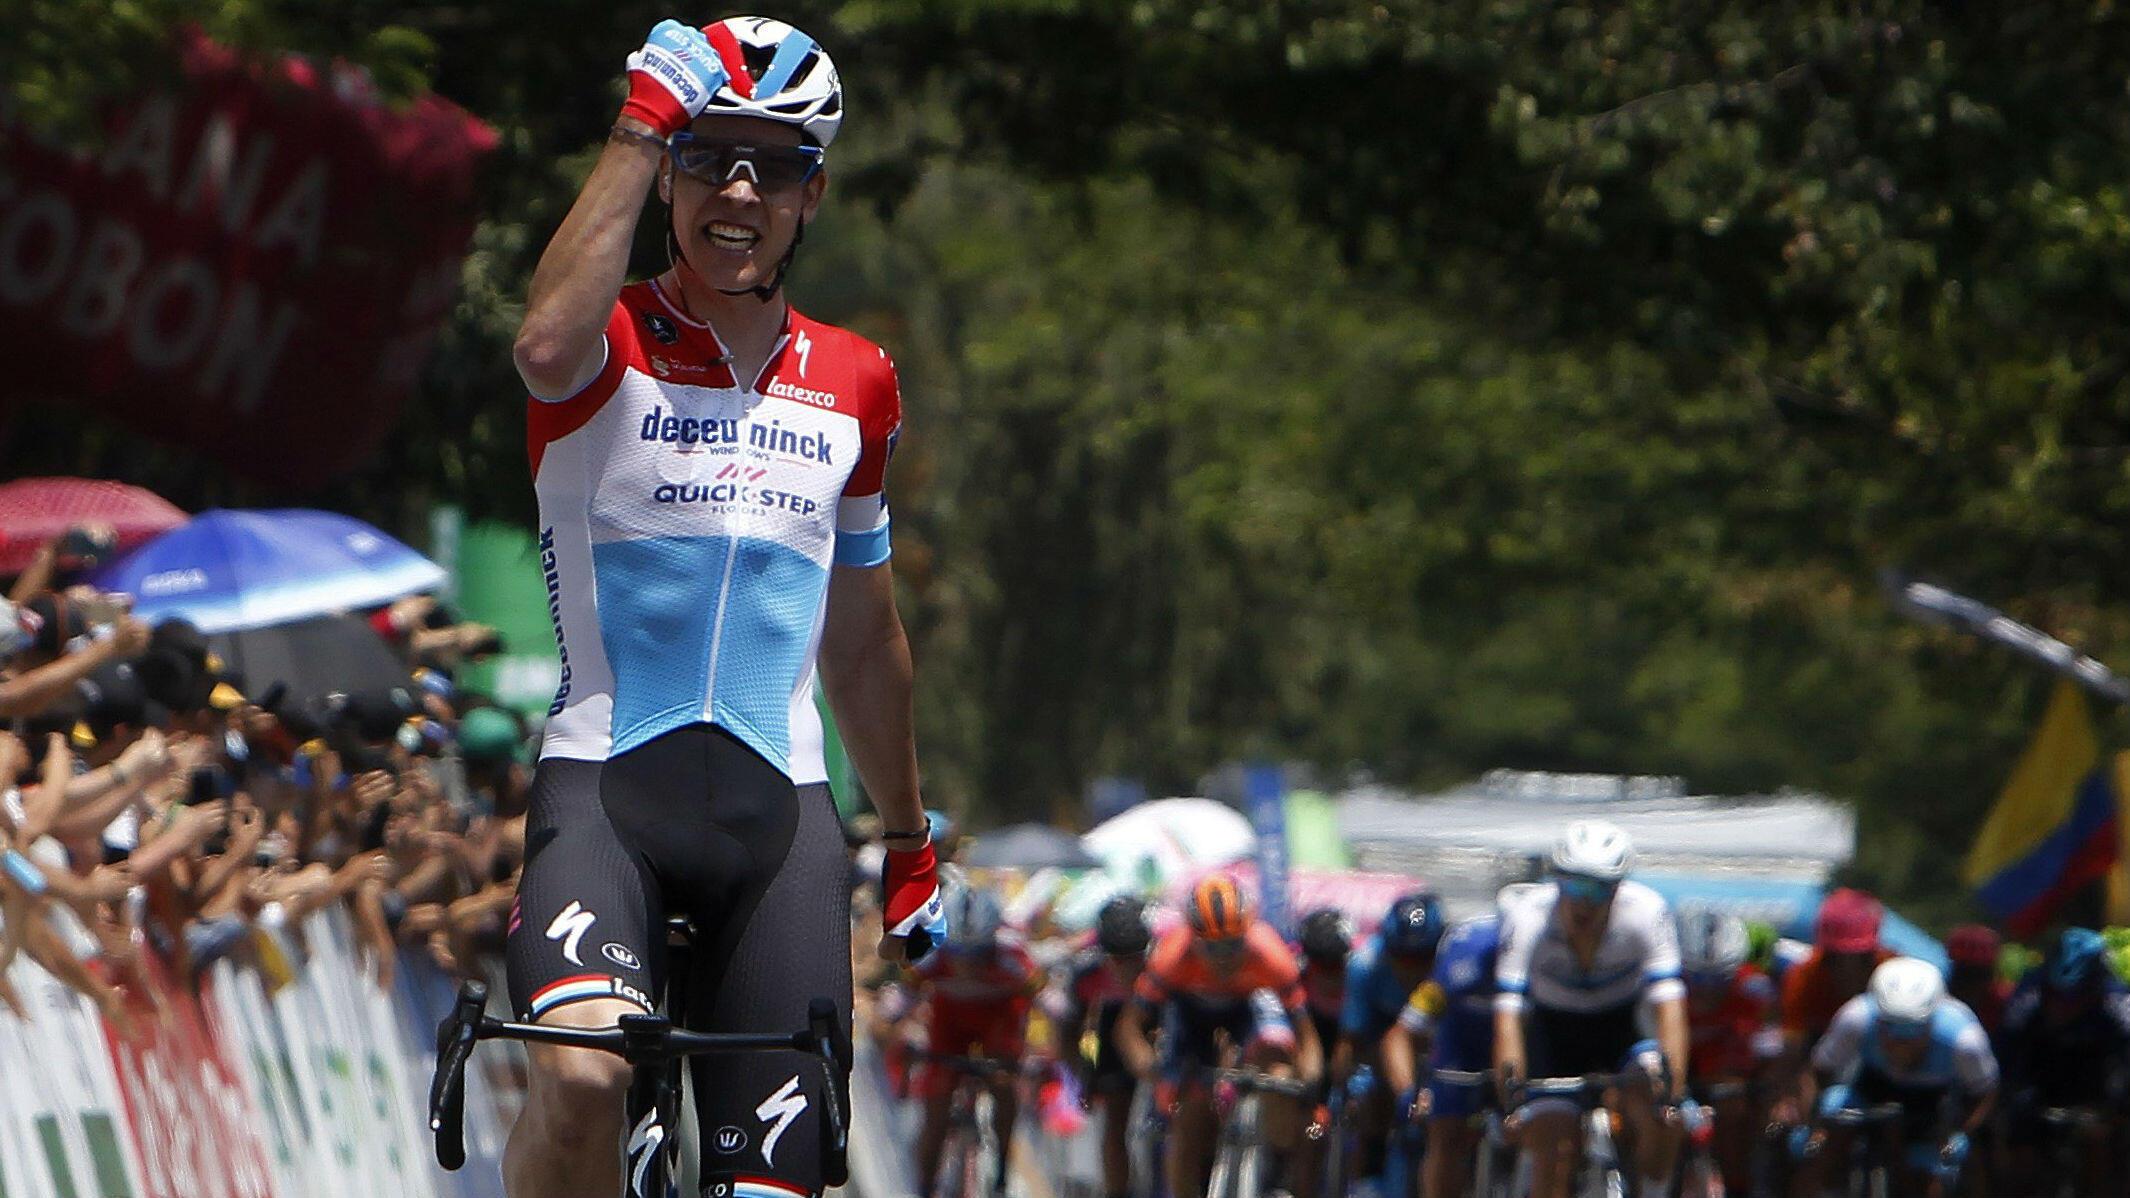 El ciclista luxemburgués Bob Jungels (Deceuninck-Quick Step) cruza en soledad la meta y gana la cuarta etapa del Tour Colombia 2.1, en Medellín, Antioquia, Colombia, el 15 de febrero de 2019.